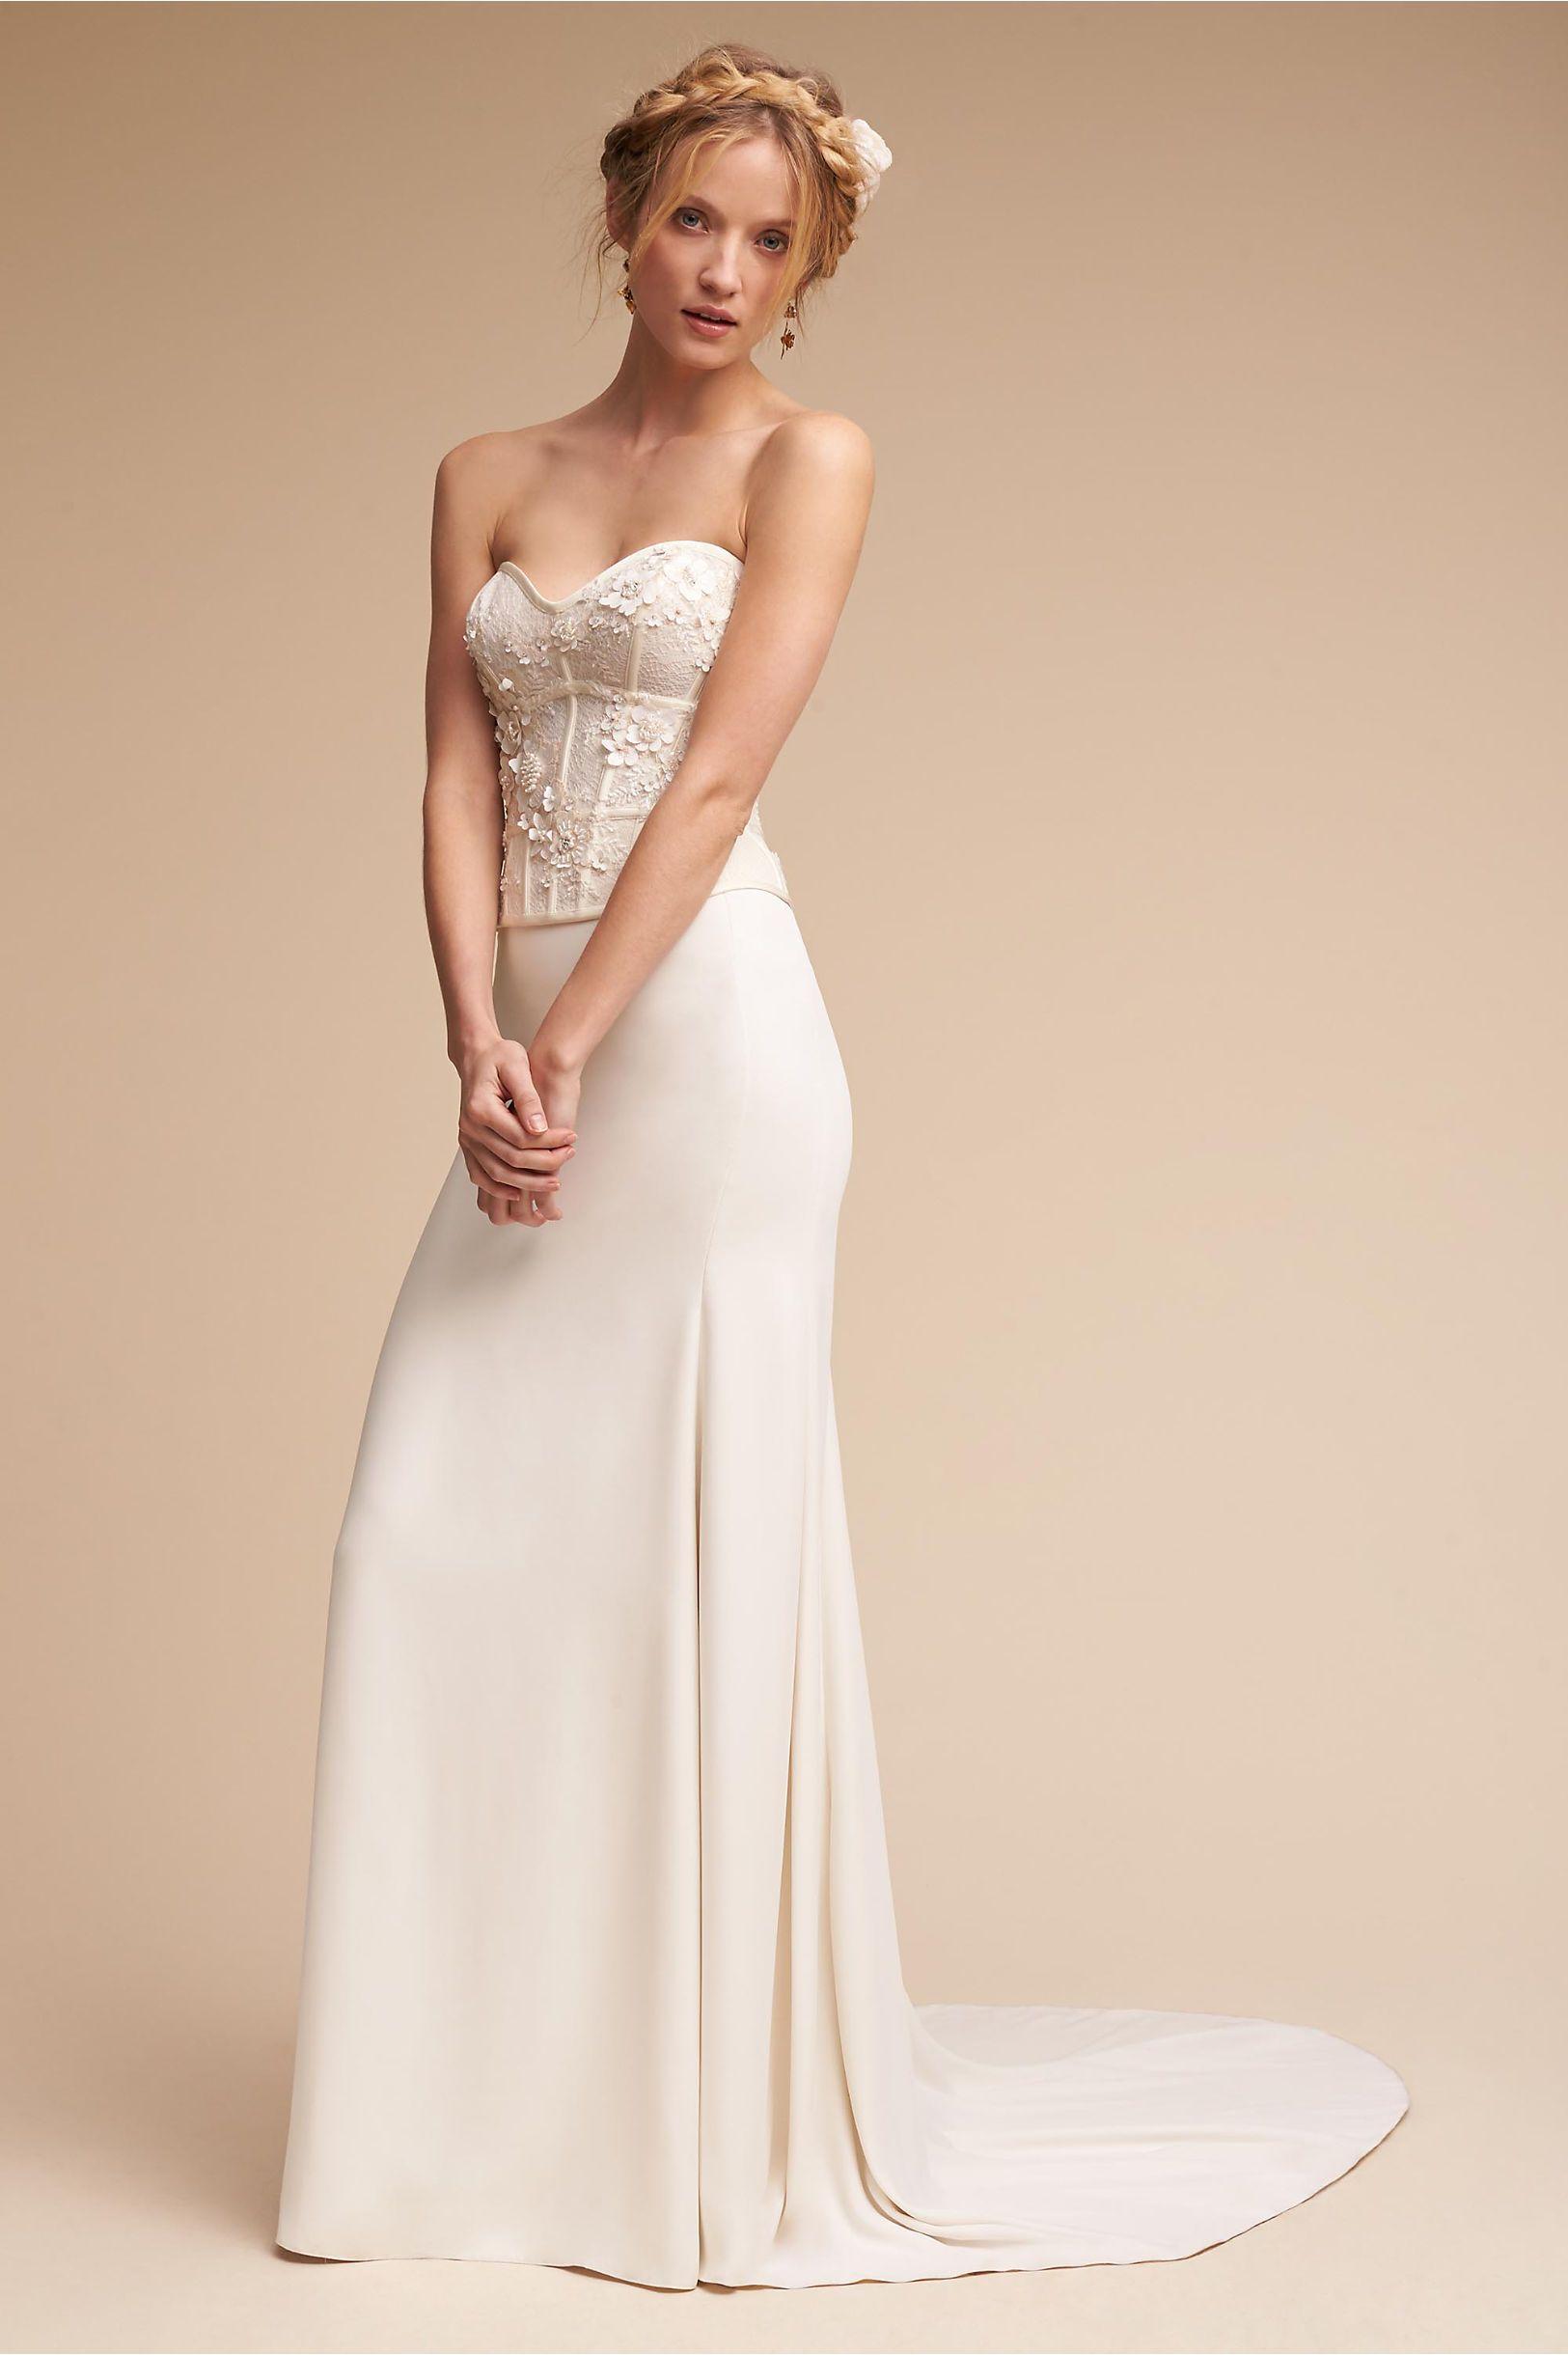 Top 11 Bridal Trends for 2017 | Bodice wedding dress, Wedding dress ...